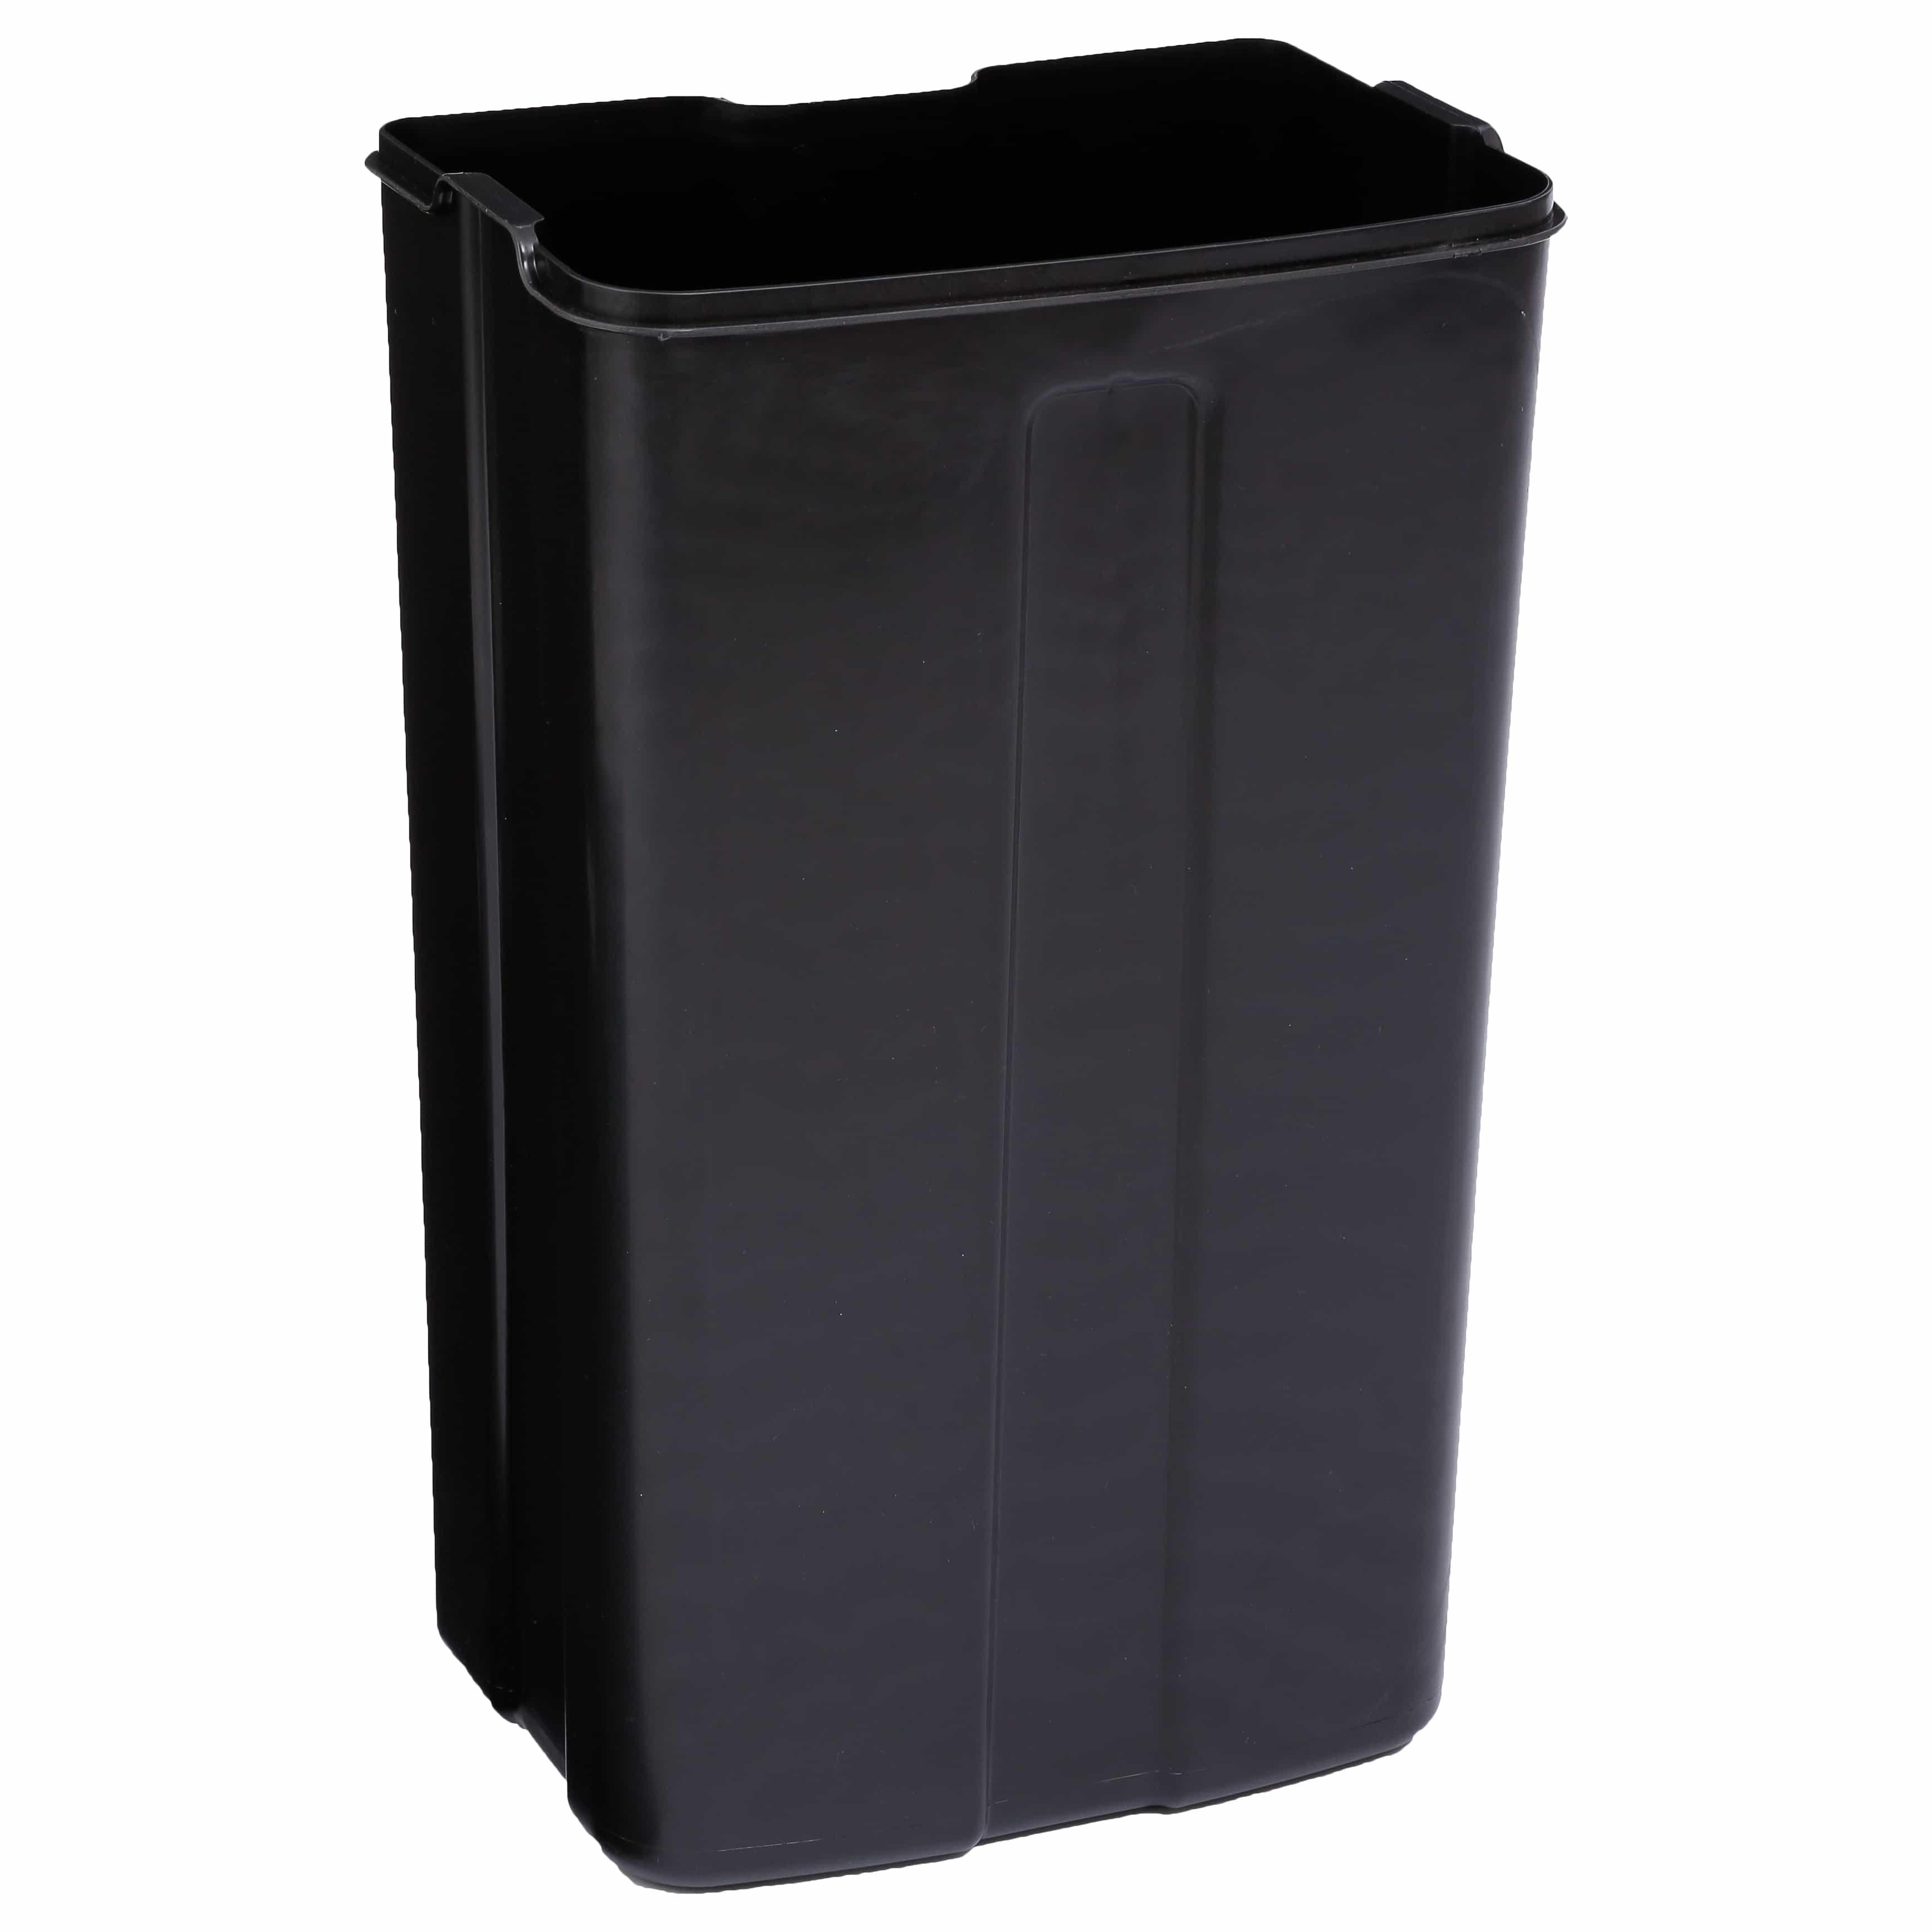 4goodz pedaalemmer 30 liter met uitneembare emmer 34x32x61cm - Wit